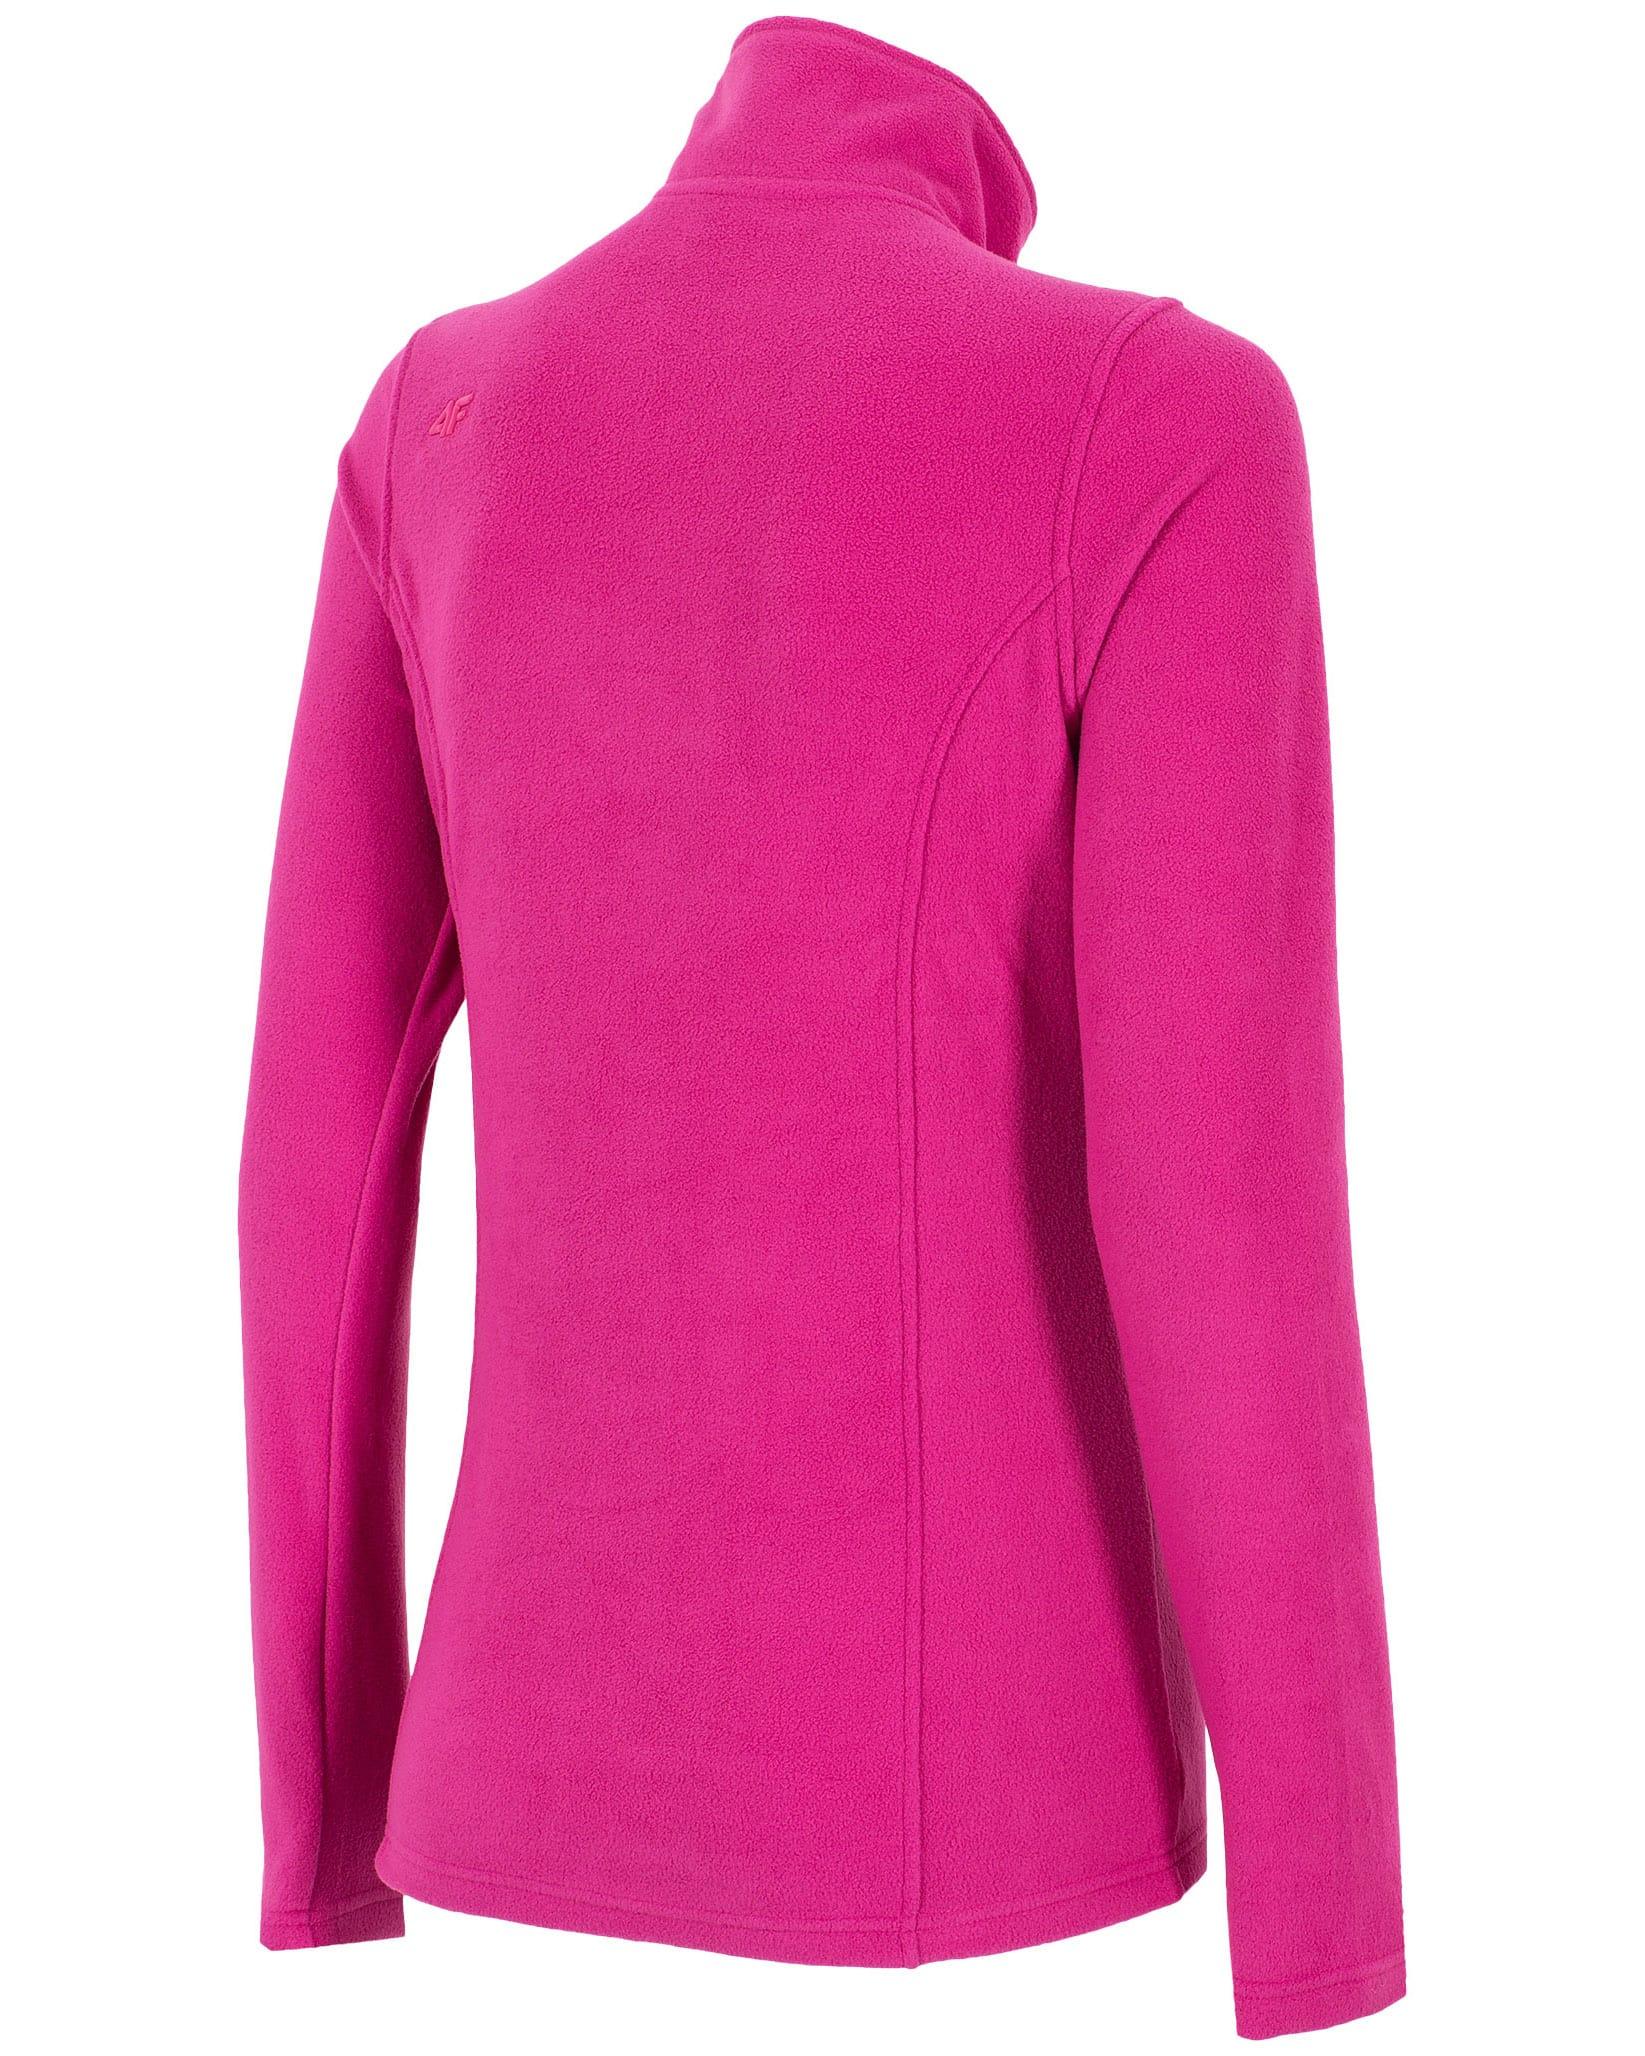 4F Fleece Underwear - Pink